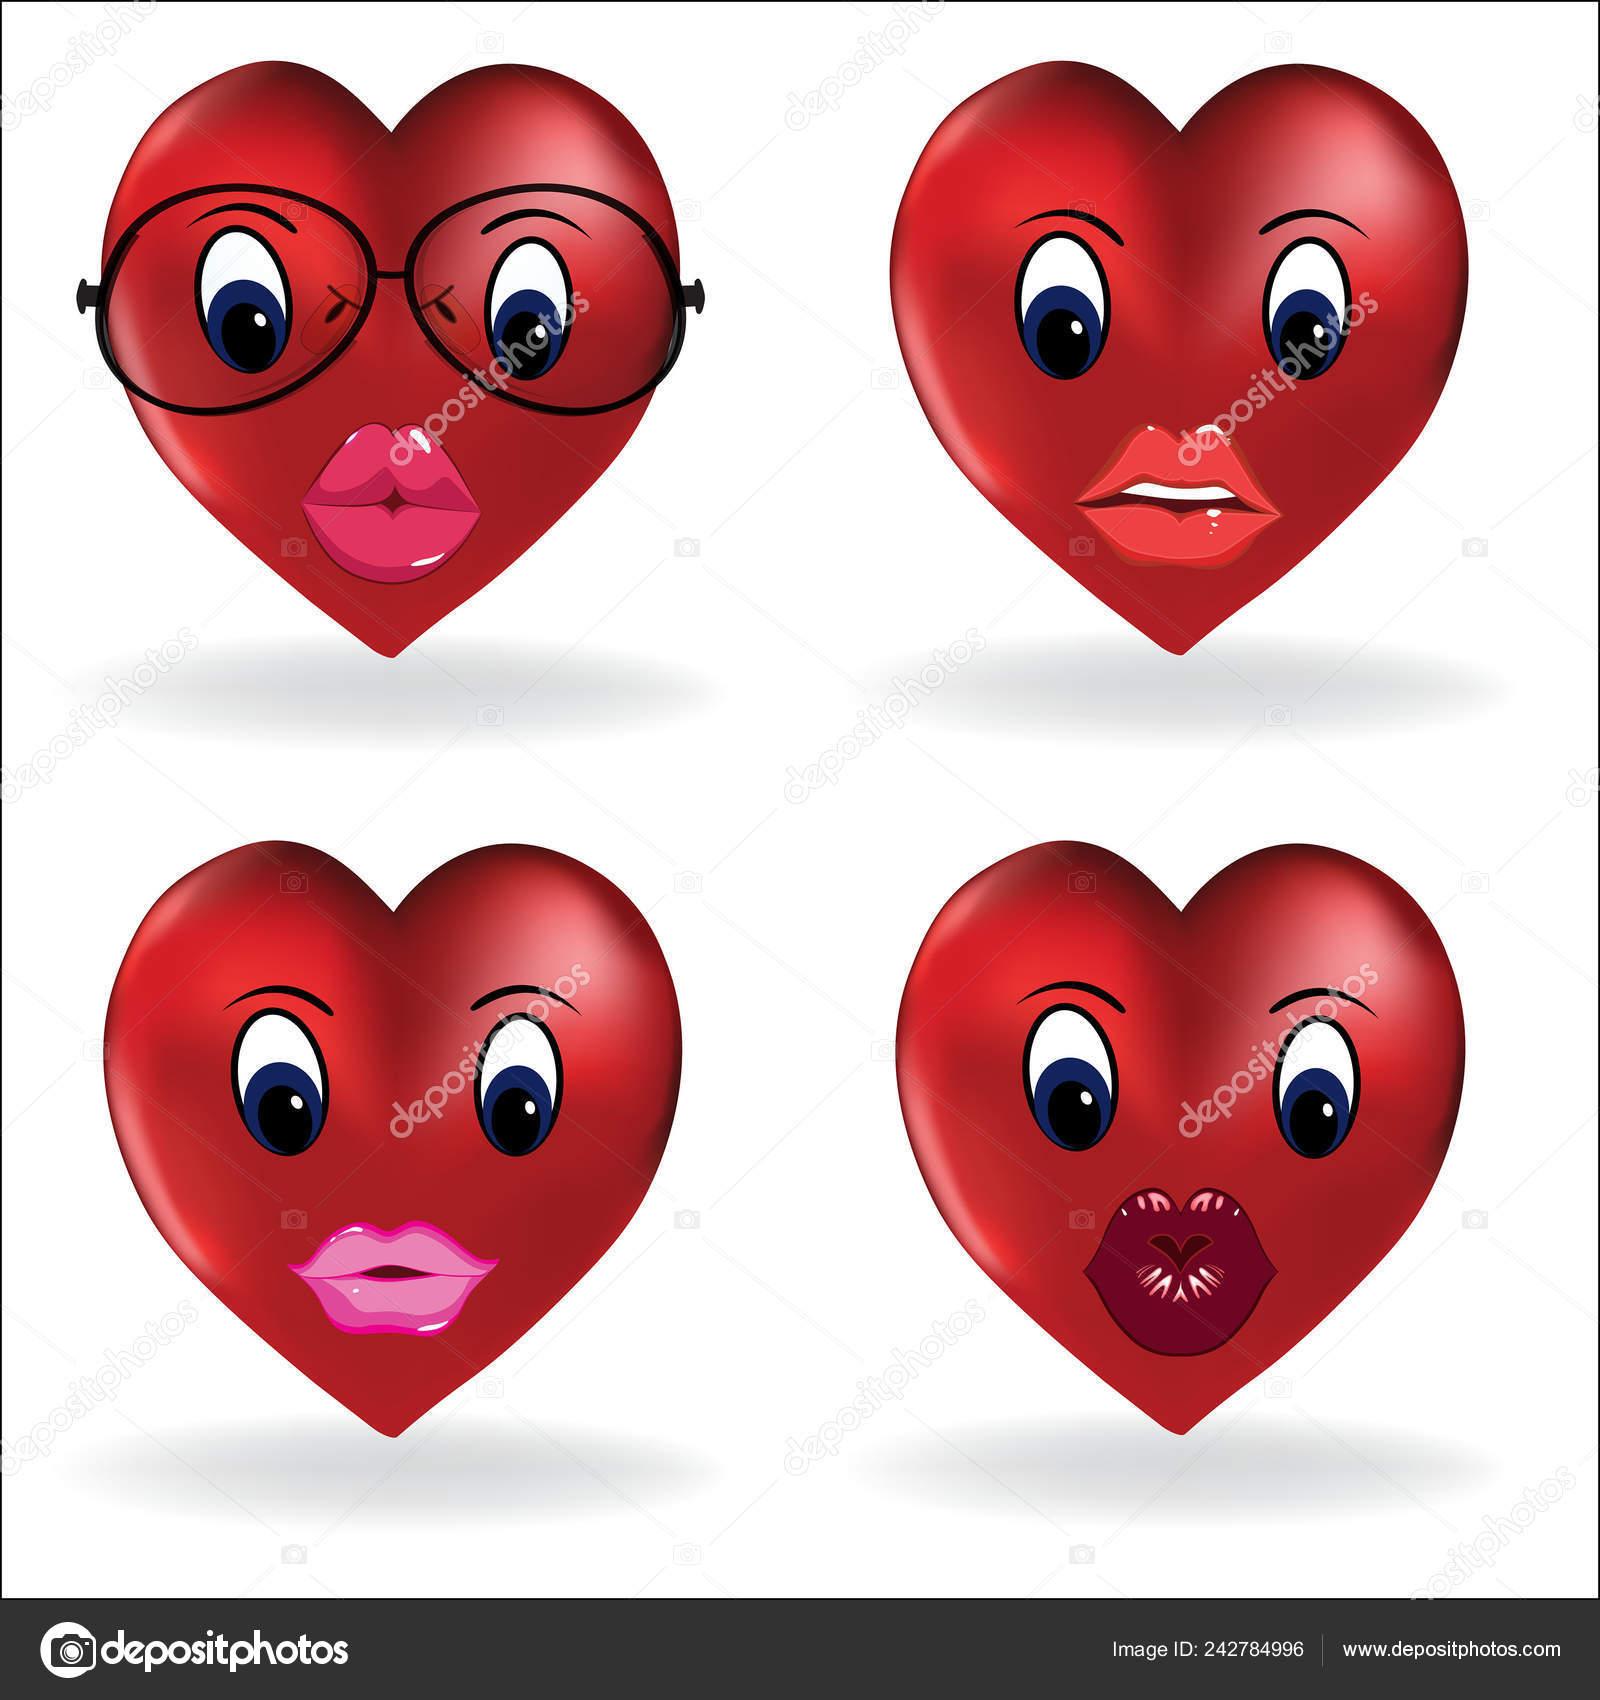 Smiley lips heart | Emoji Heart Smiley Lip Sexy Creator